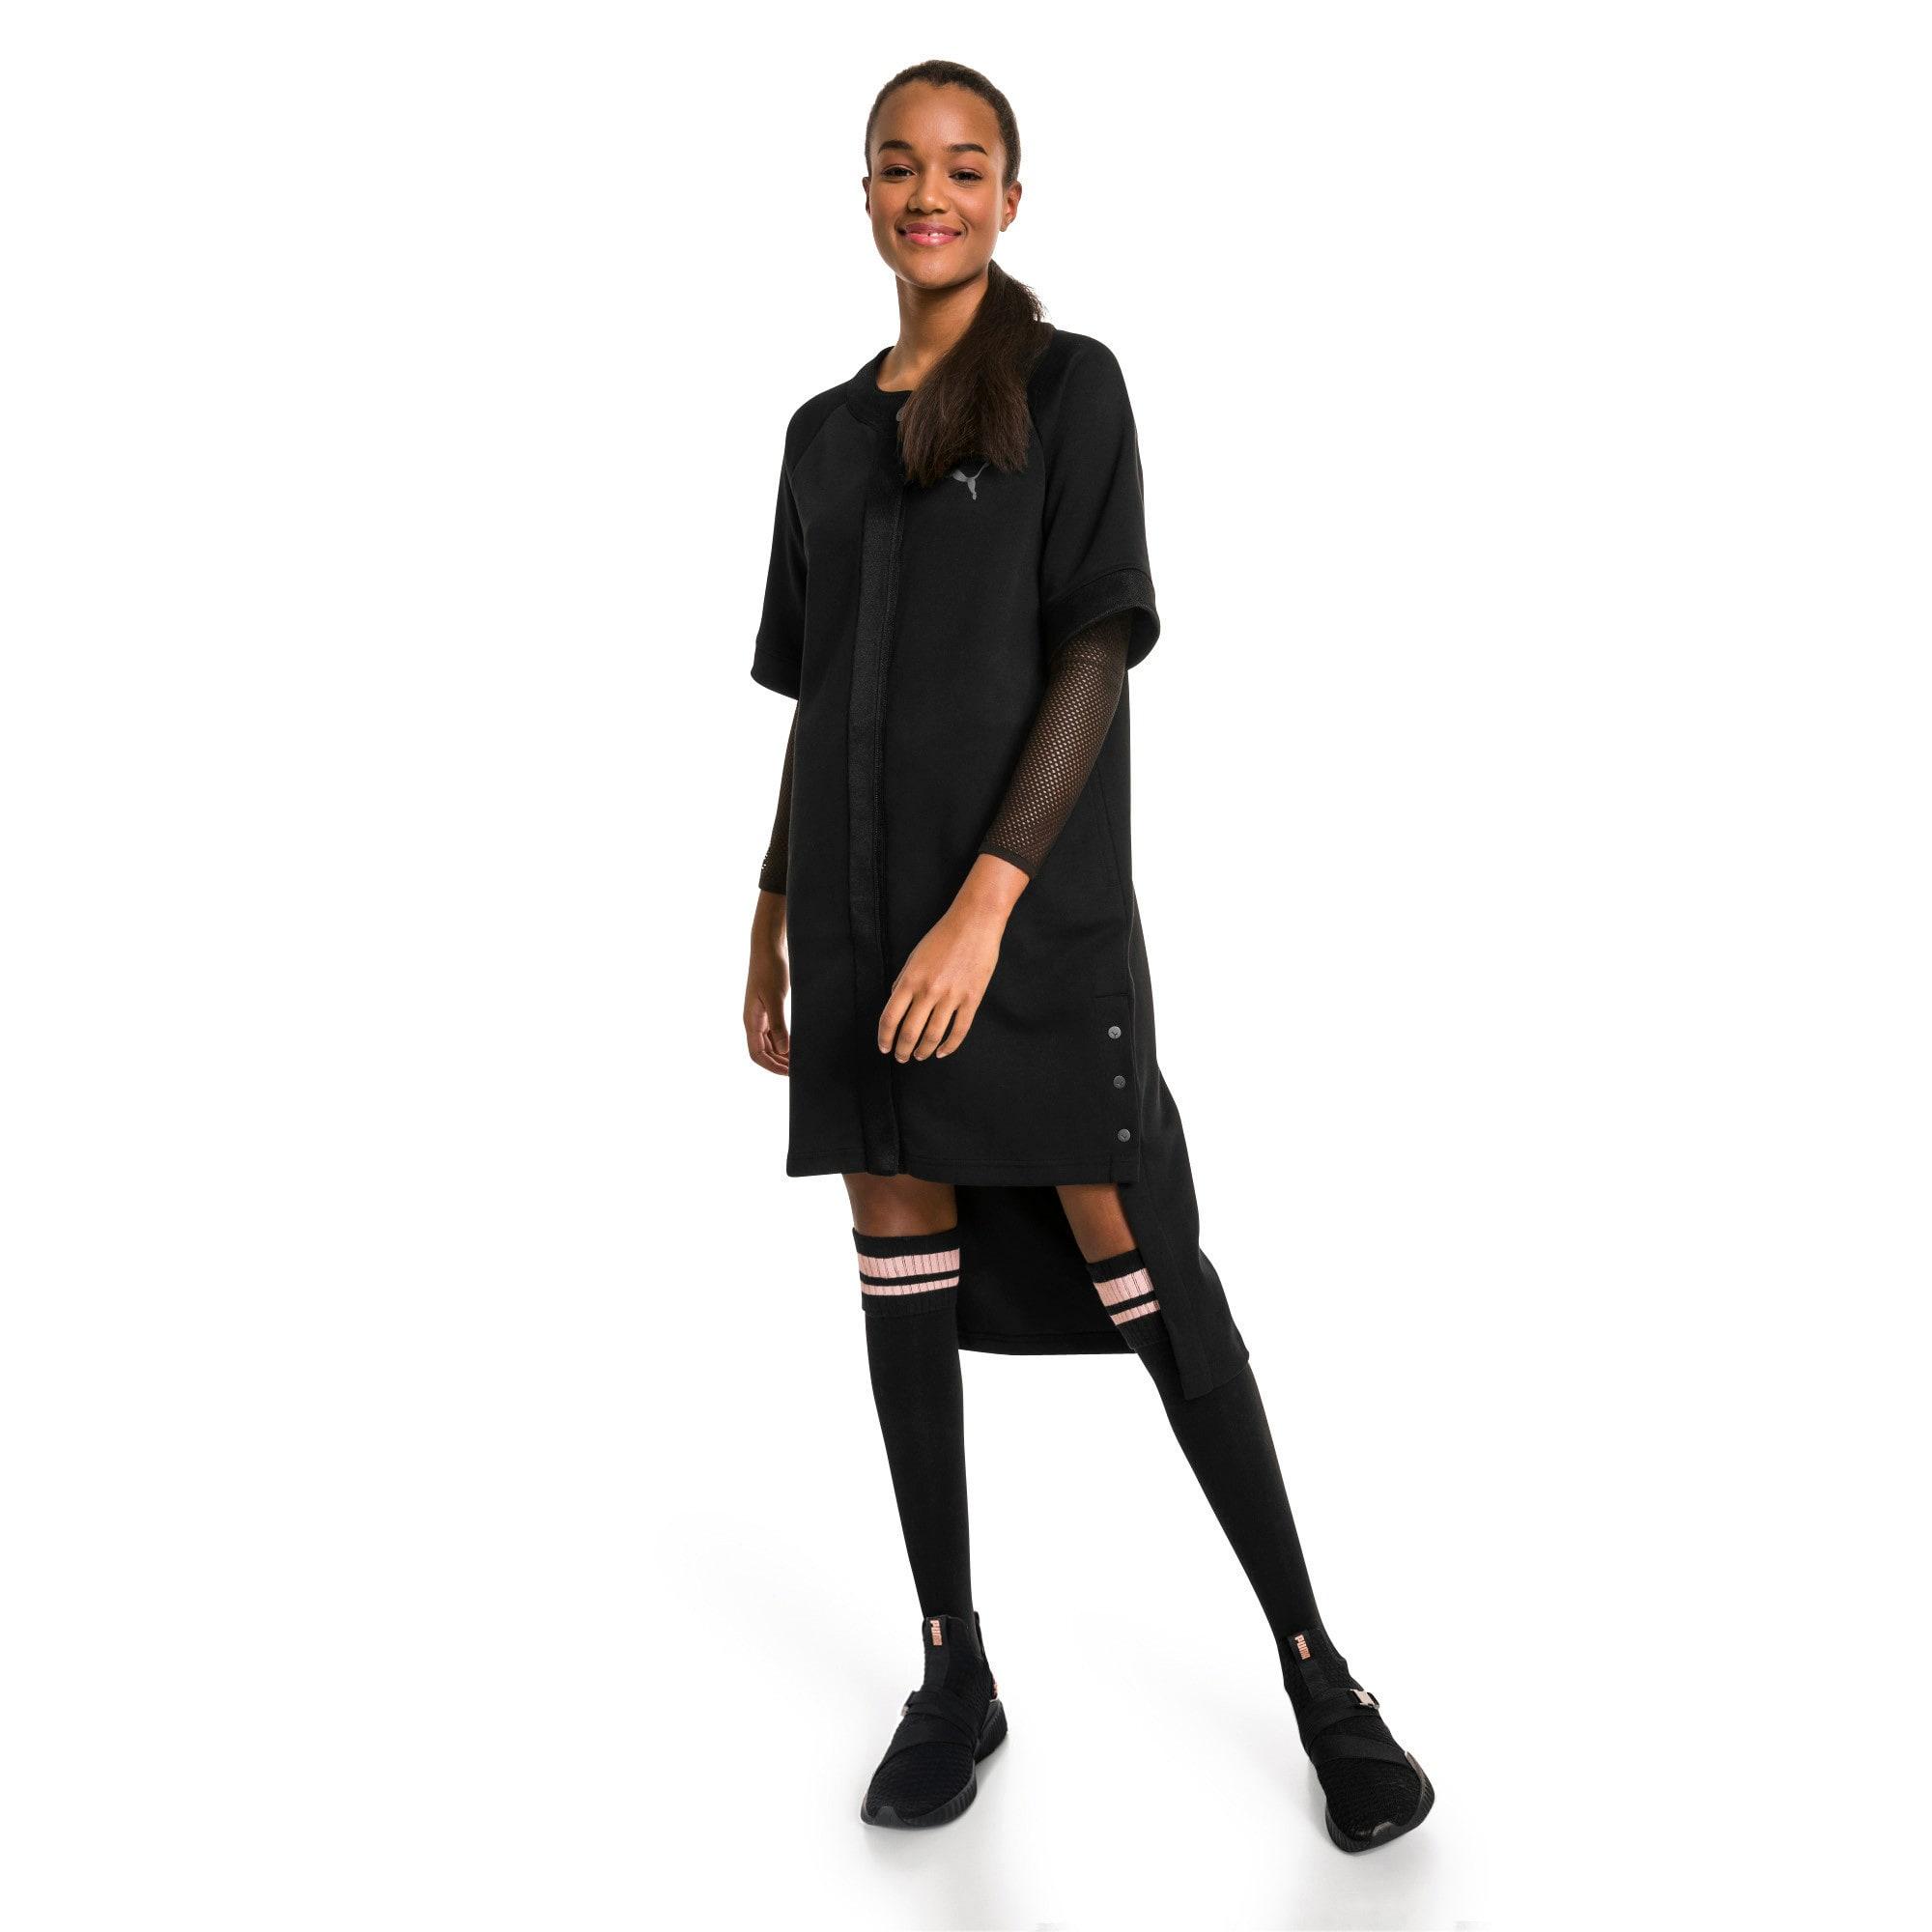 Thumbnail 3 of SG x PUMA Dress, Puma Black, medium